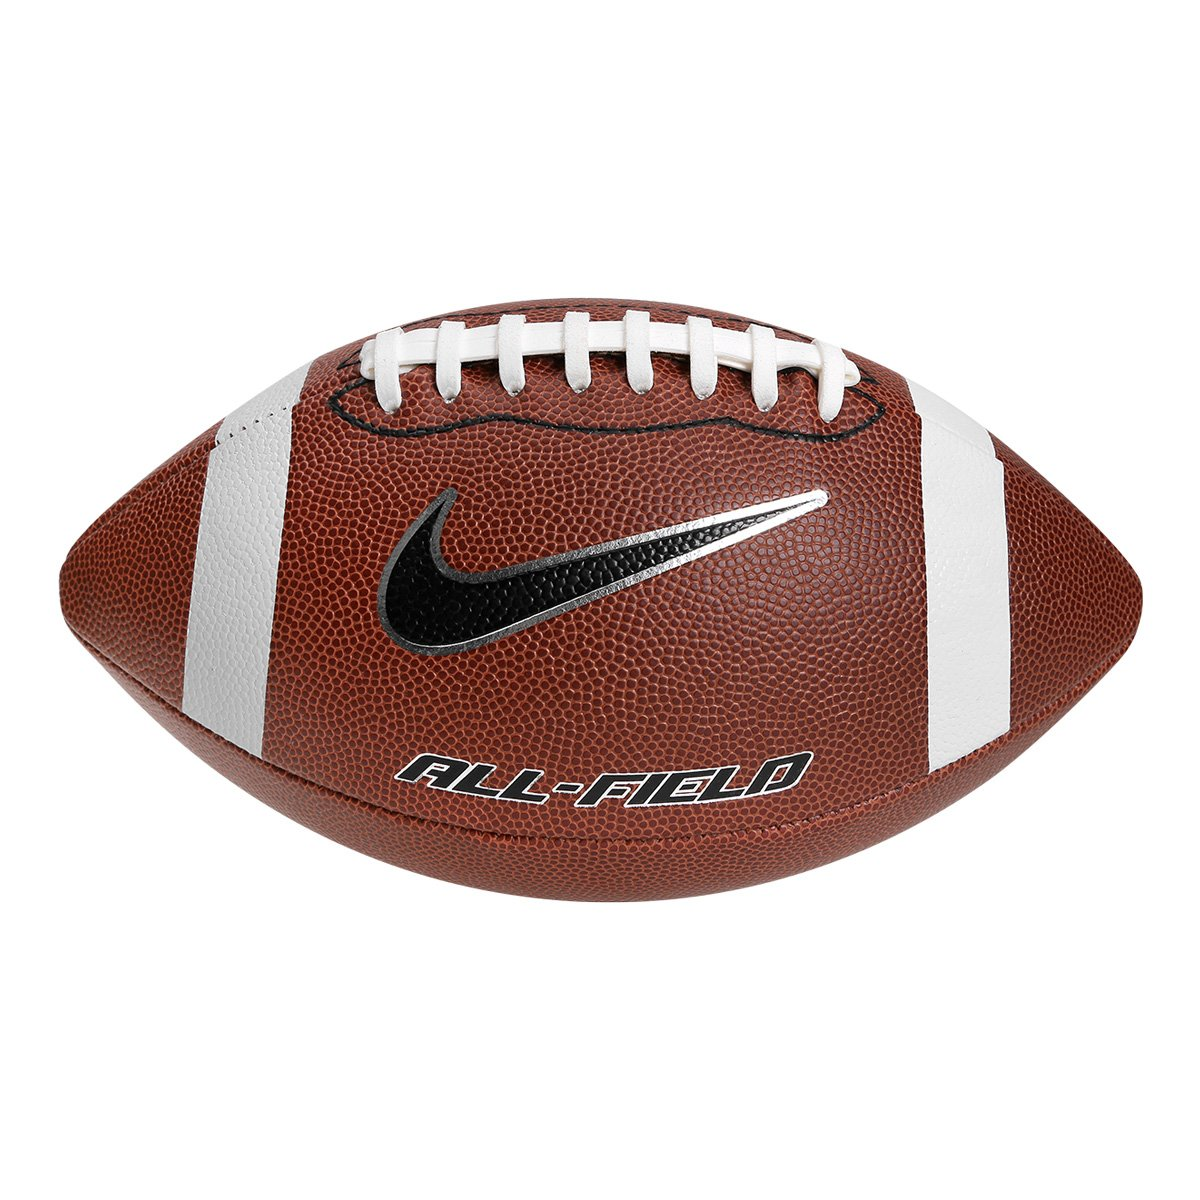 Bola de Futebol Americano Nike All-Field 3.0 FB 9 Official 38514b70e3f66